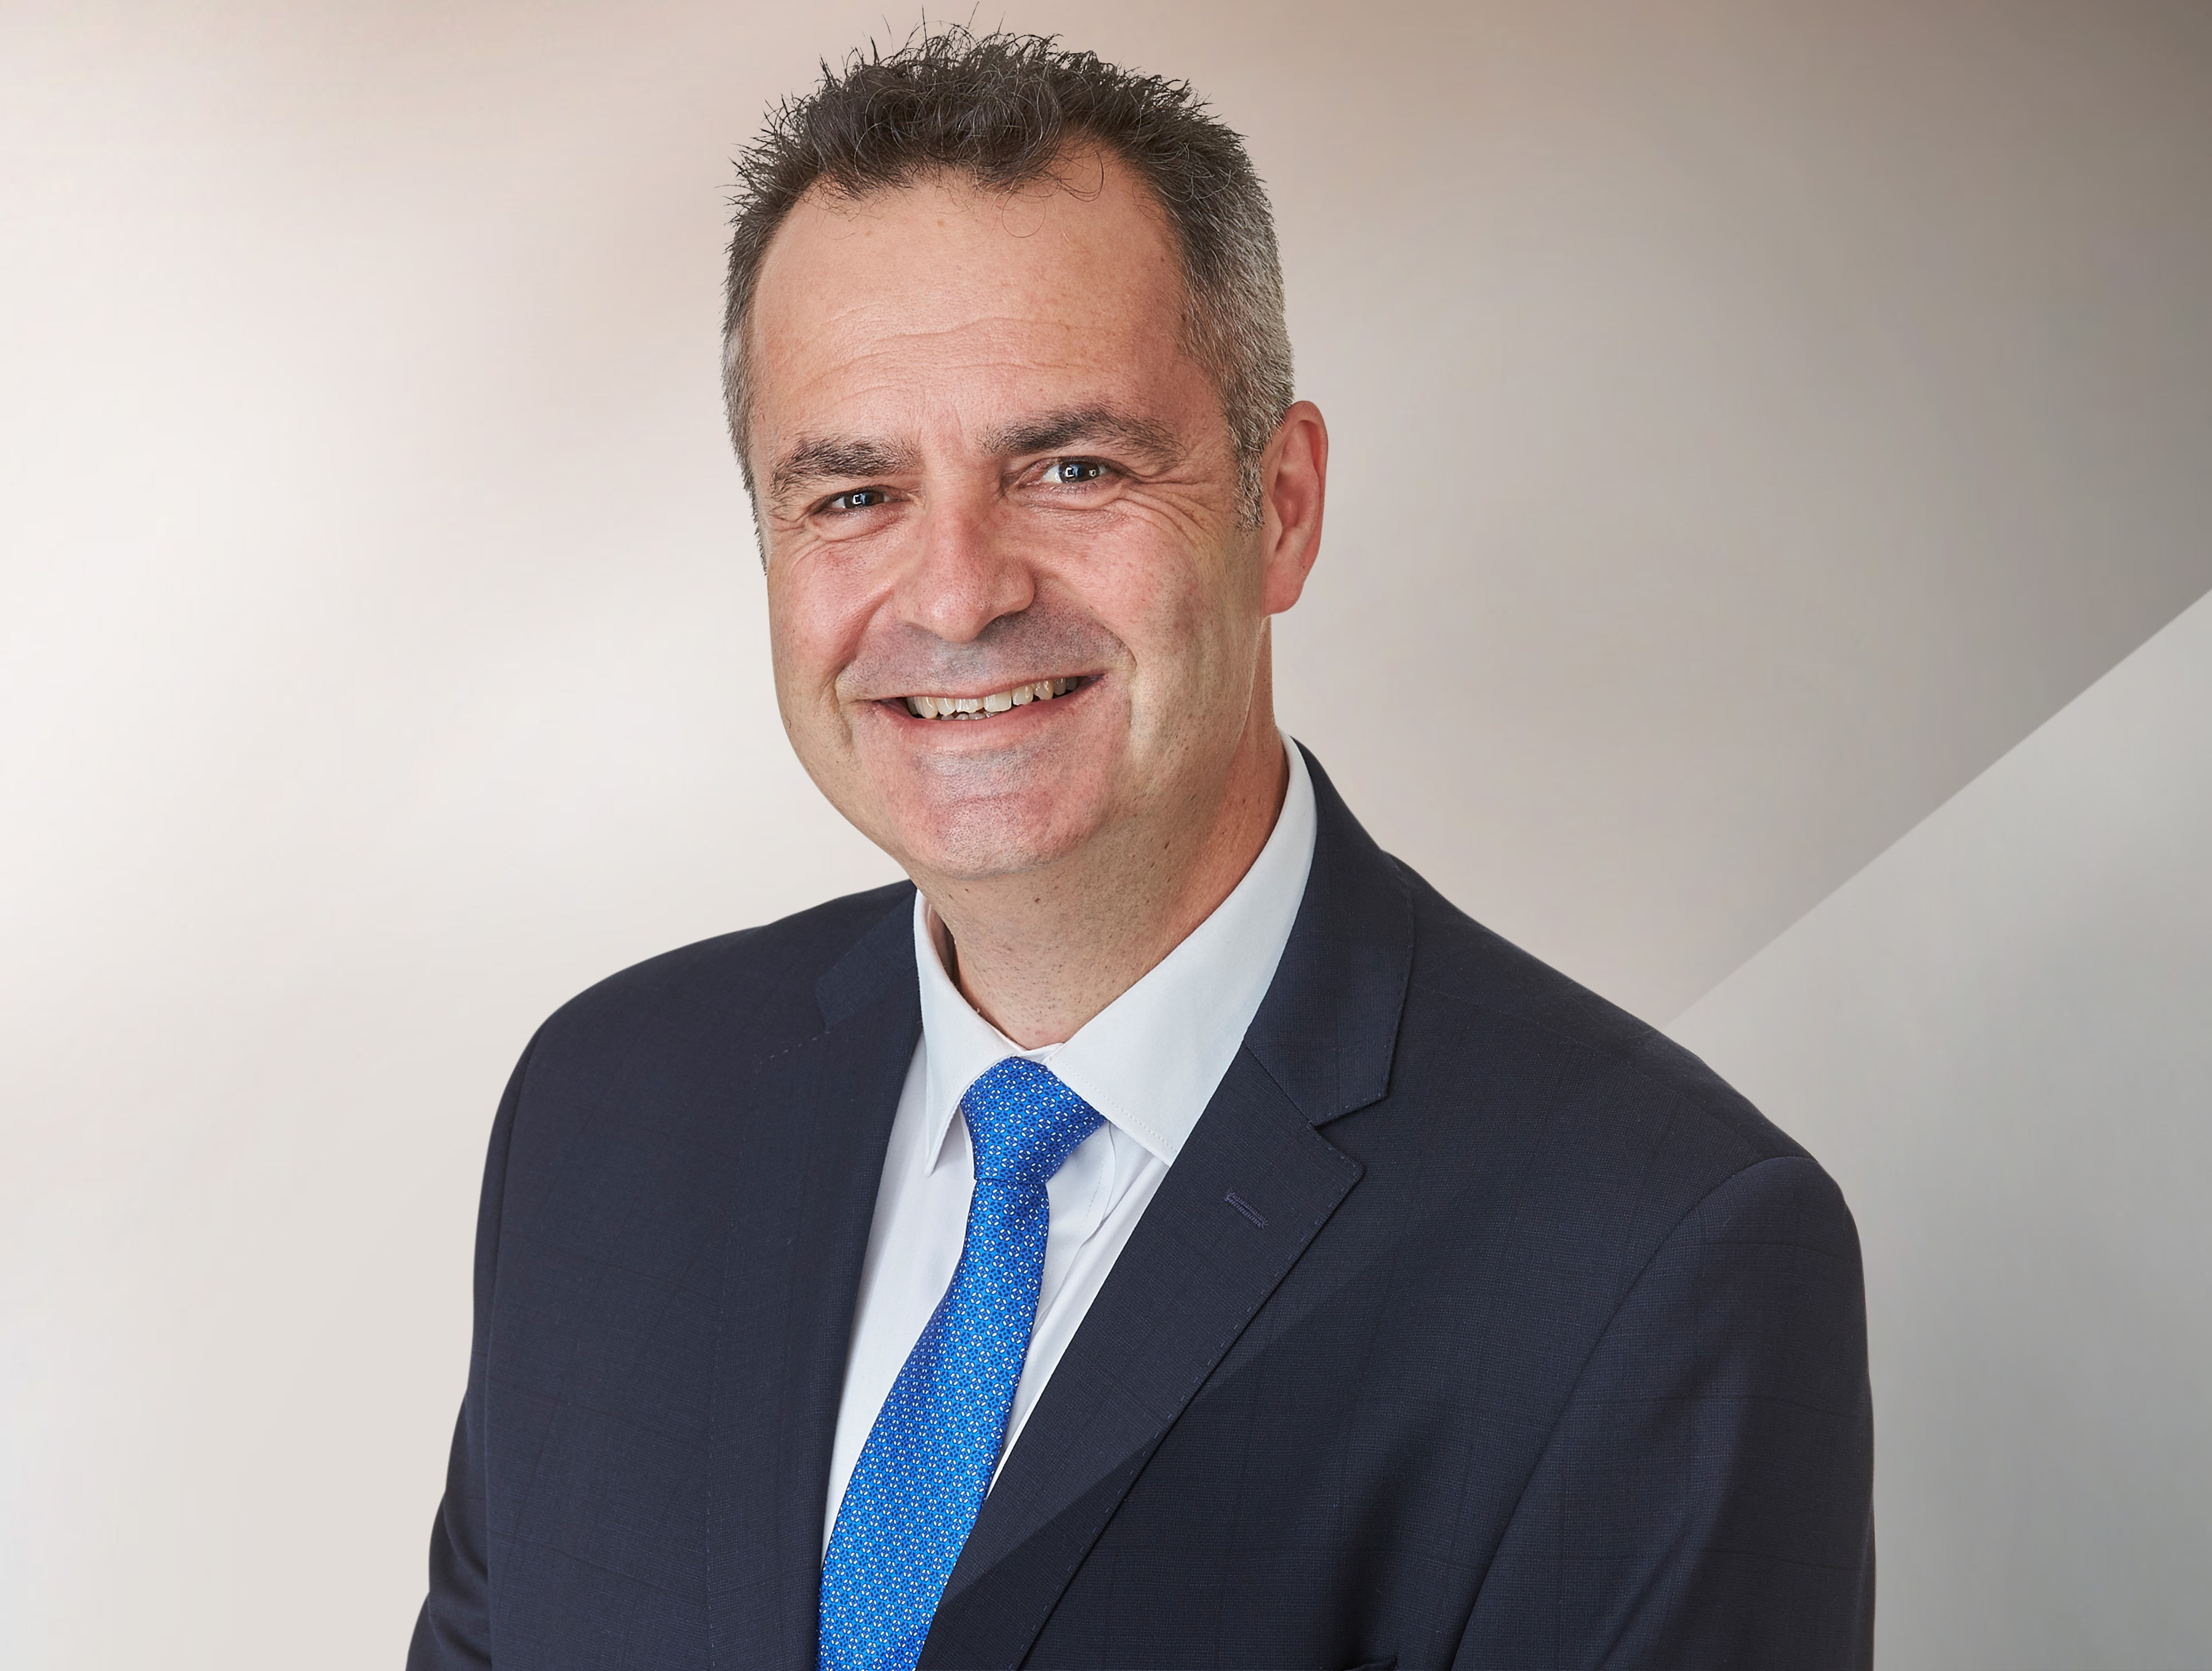 Michael Schneider, Managing Director Bunnings Group